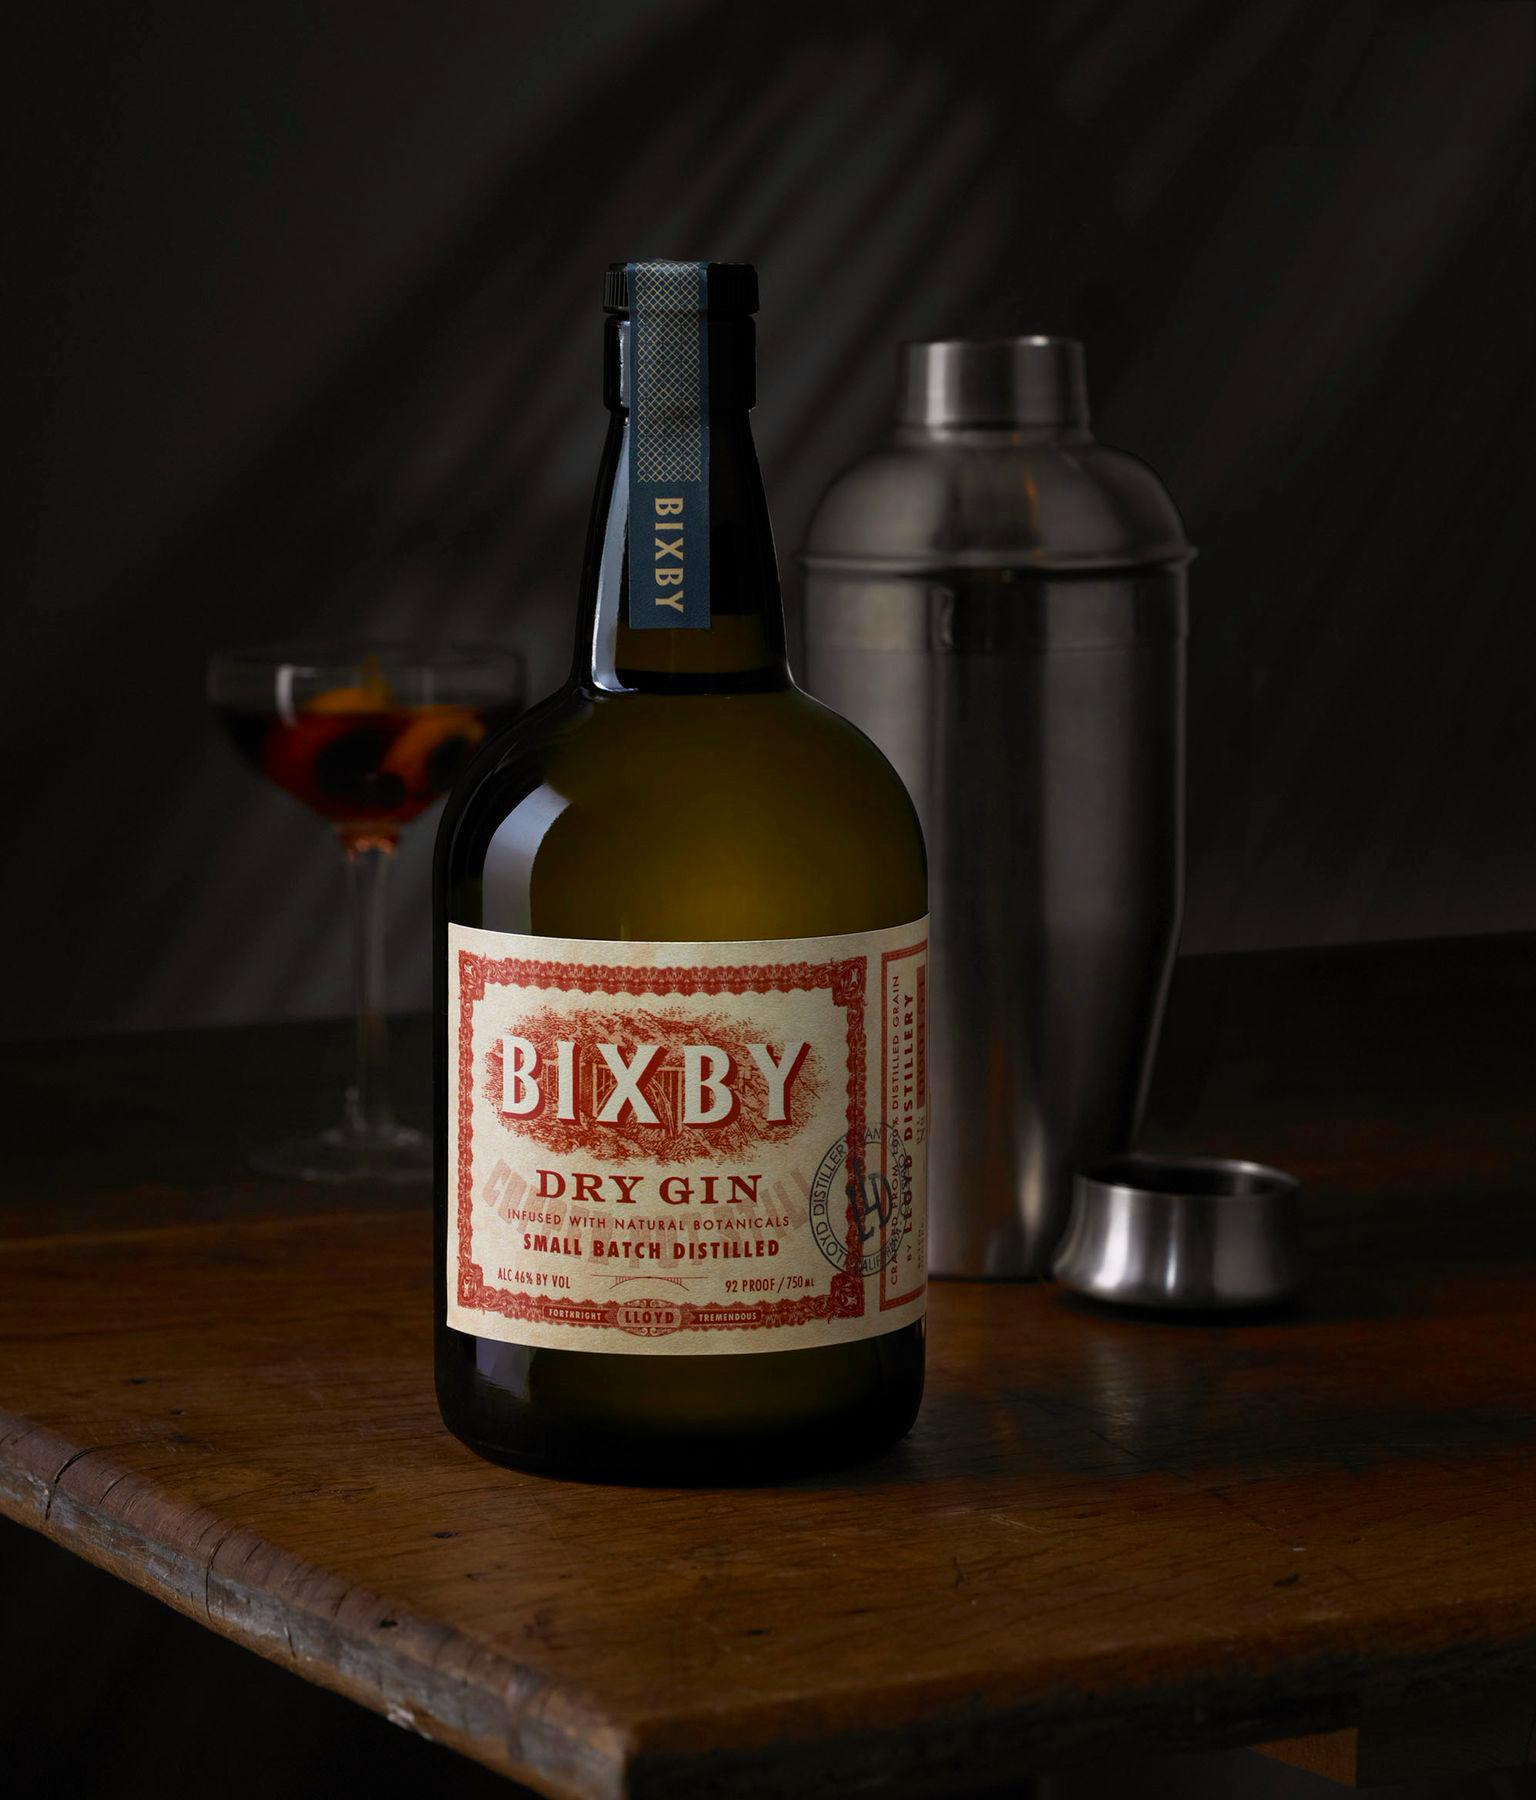 Bixby-color_w.jpg